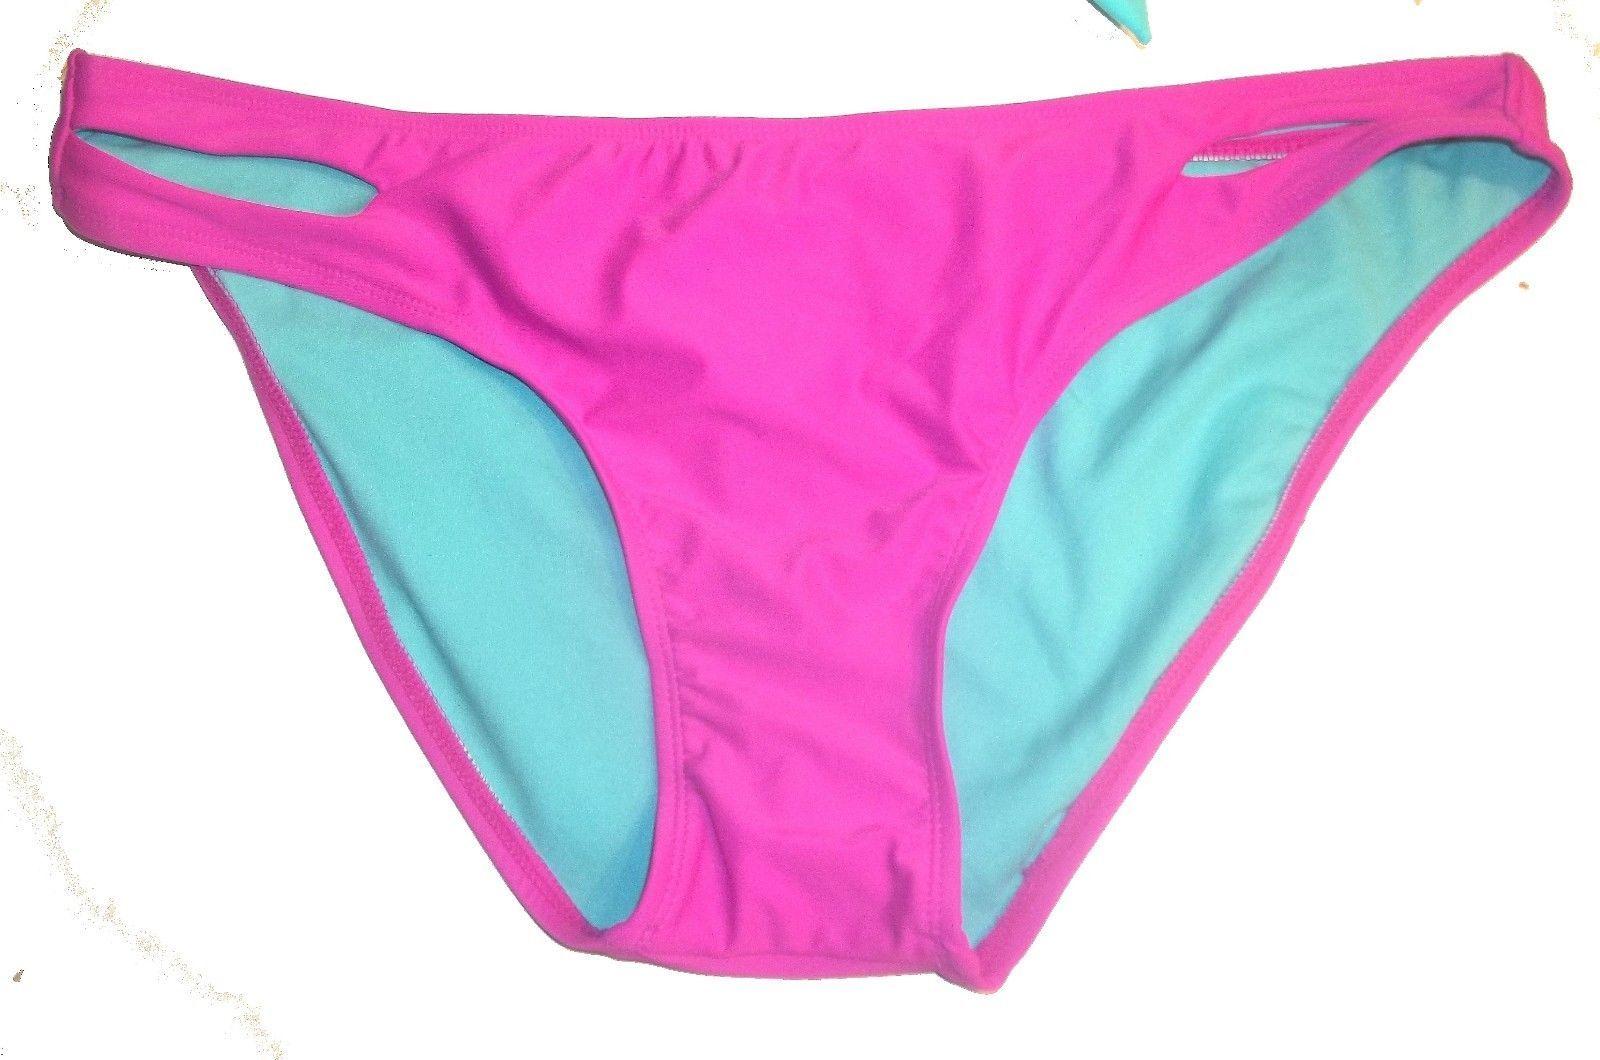 eb3e61859eb7e Sz M/XL - NWT Xhilaration Hot Pink & Mint Green Molded Push Up Bikini